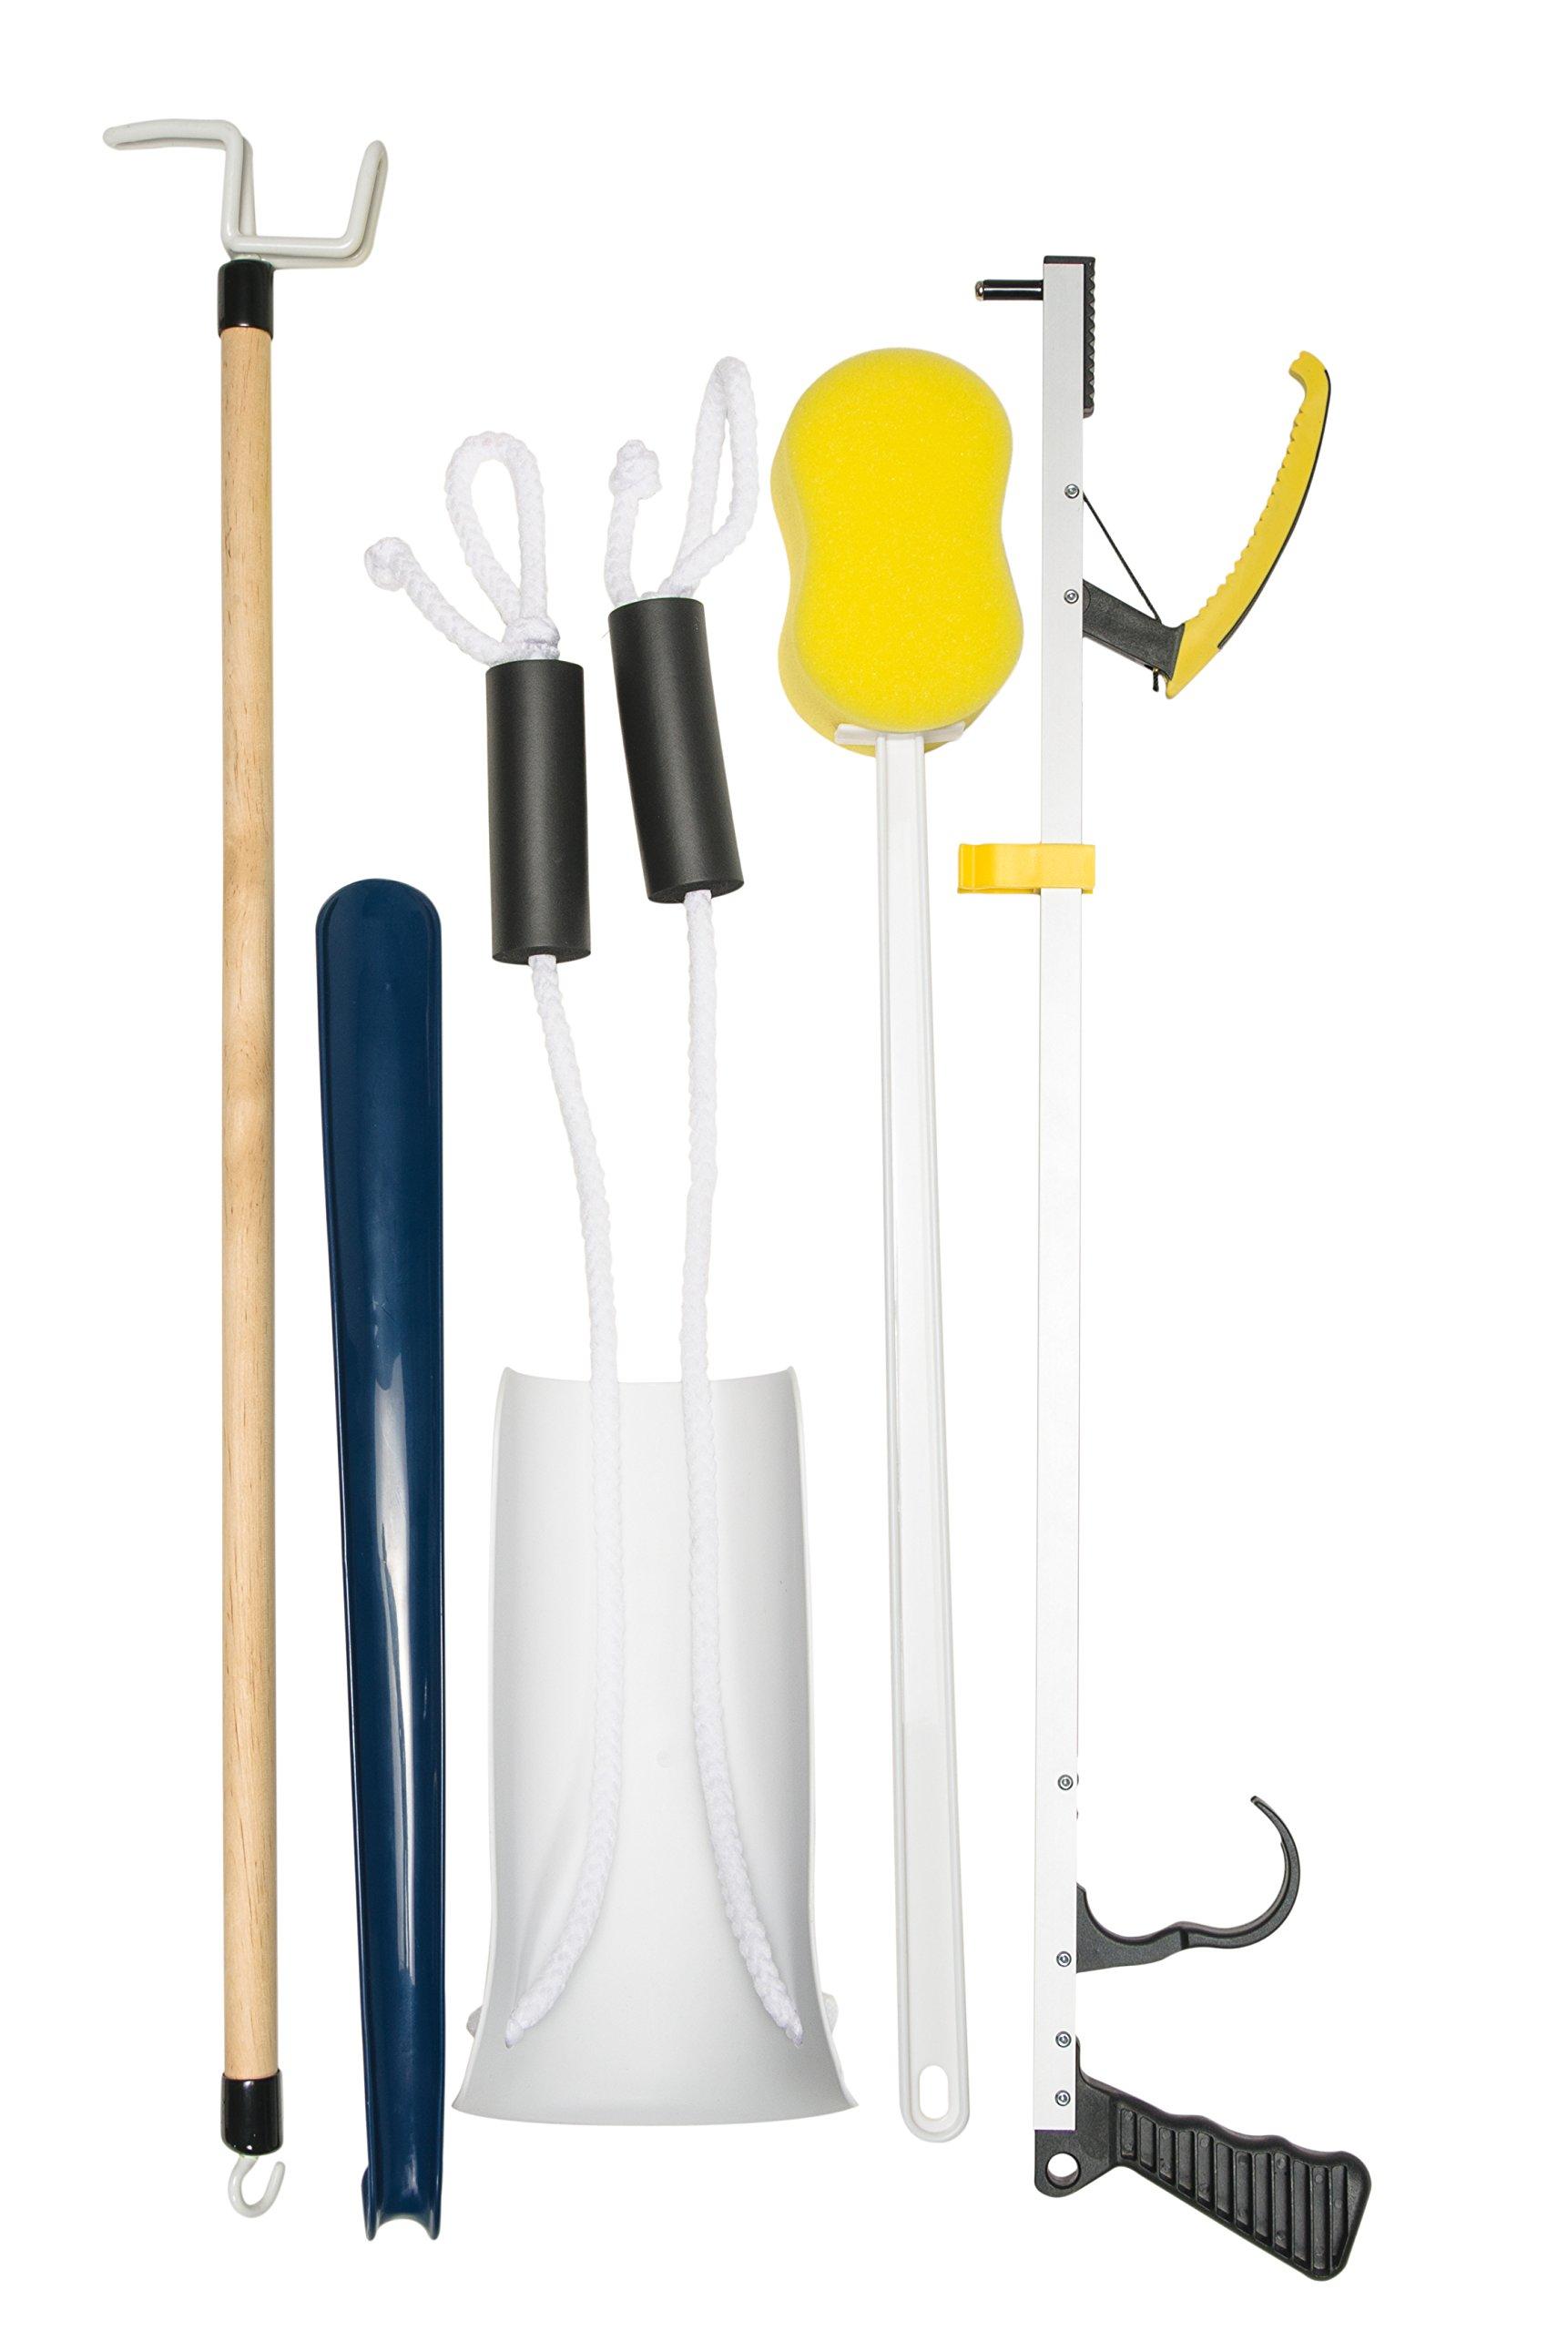 Lumex Hip Kit-Post Surgery with Dressing Stick, Sock Aid, Shoe Horn, Reacher, Long Handle Sponge, 1 Pound by Lumex (Image #1)